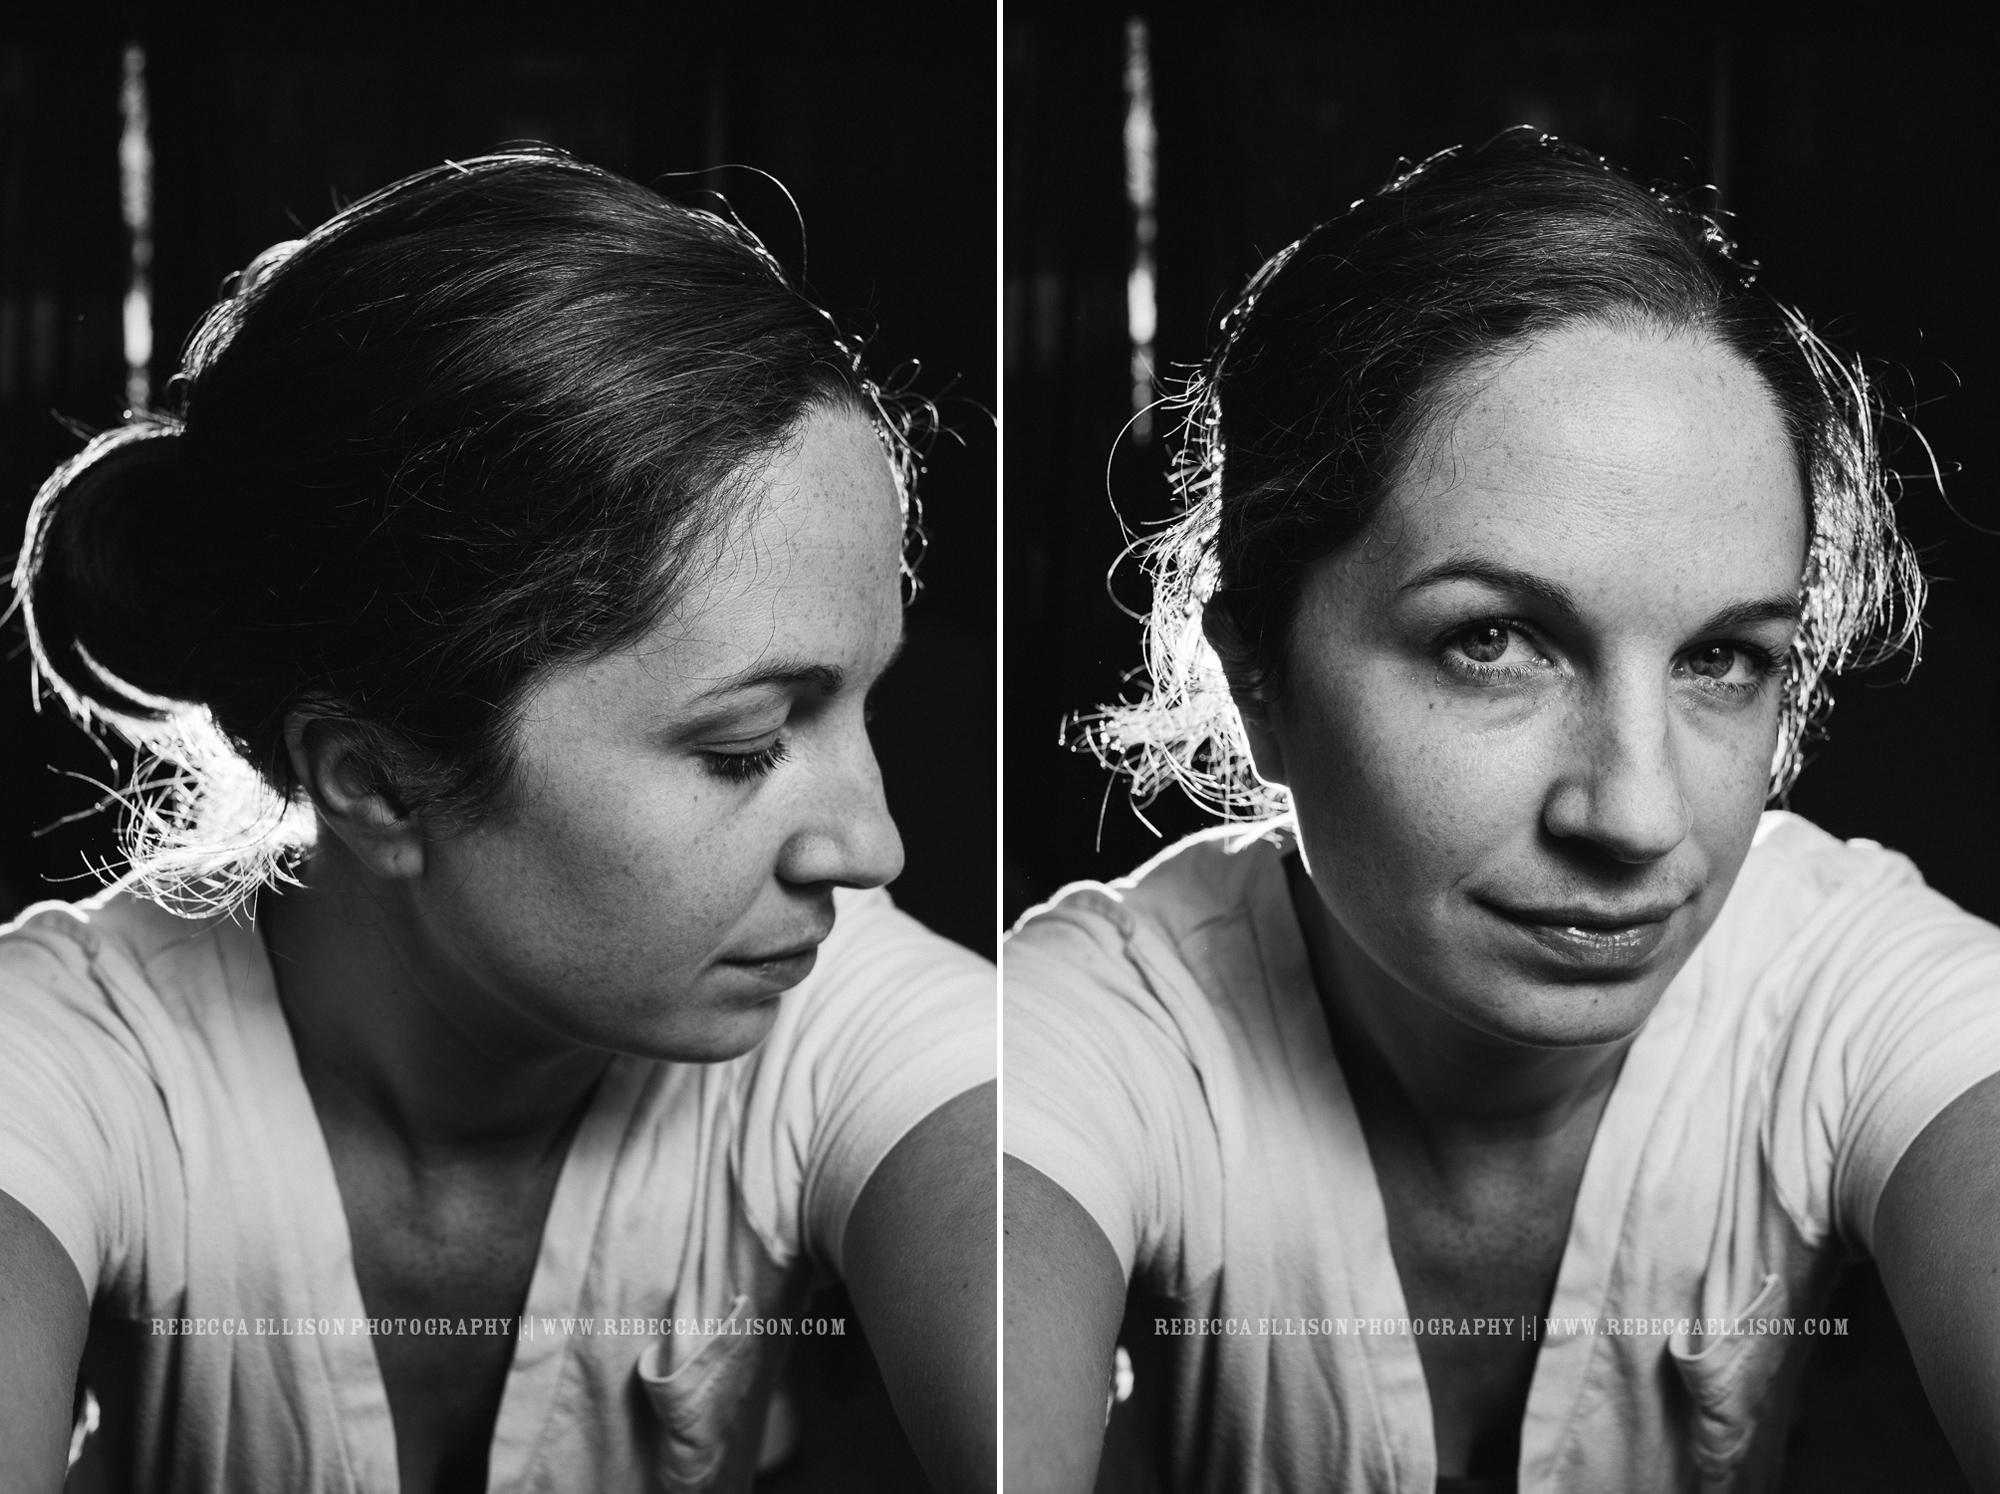 self portrait of Seattle wedding photographer Rebecca Ellison